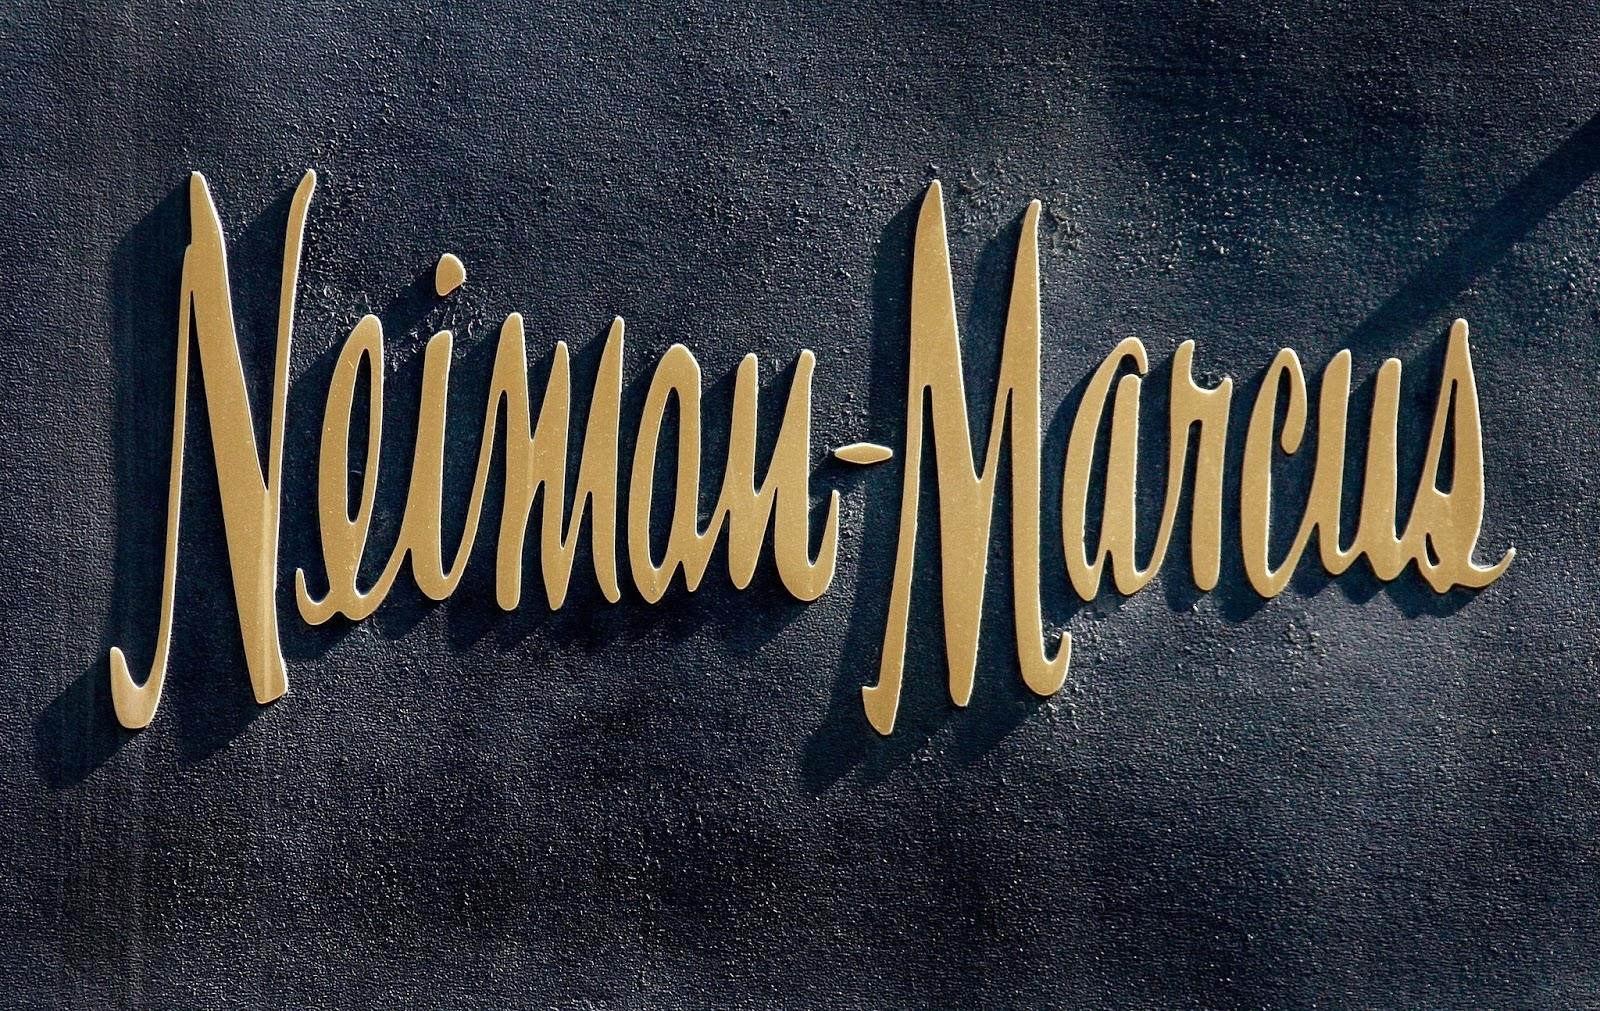 US retailer Neiman Marcus confirmed data breach after TARGET